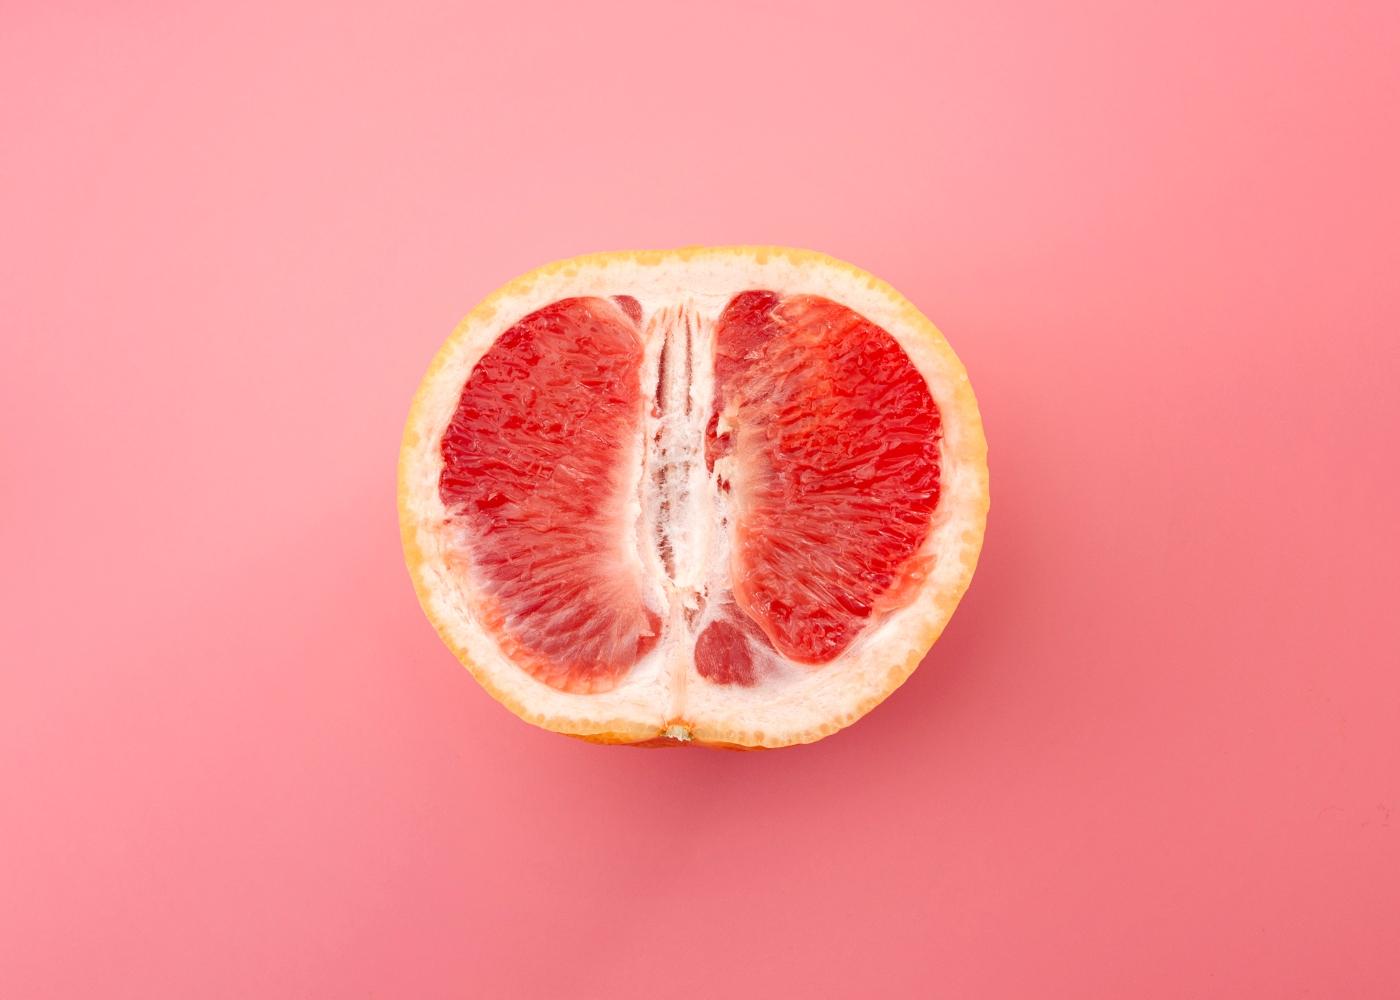 tangerina com fundo rosa a represental sexualidade feminina